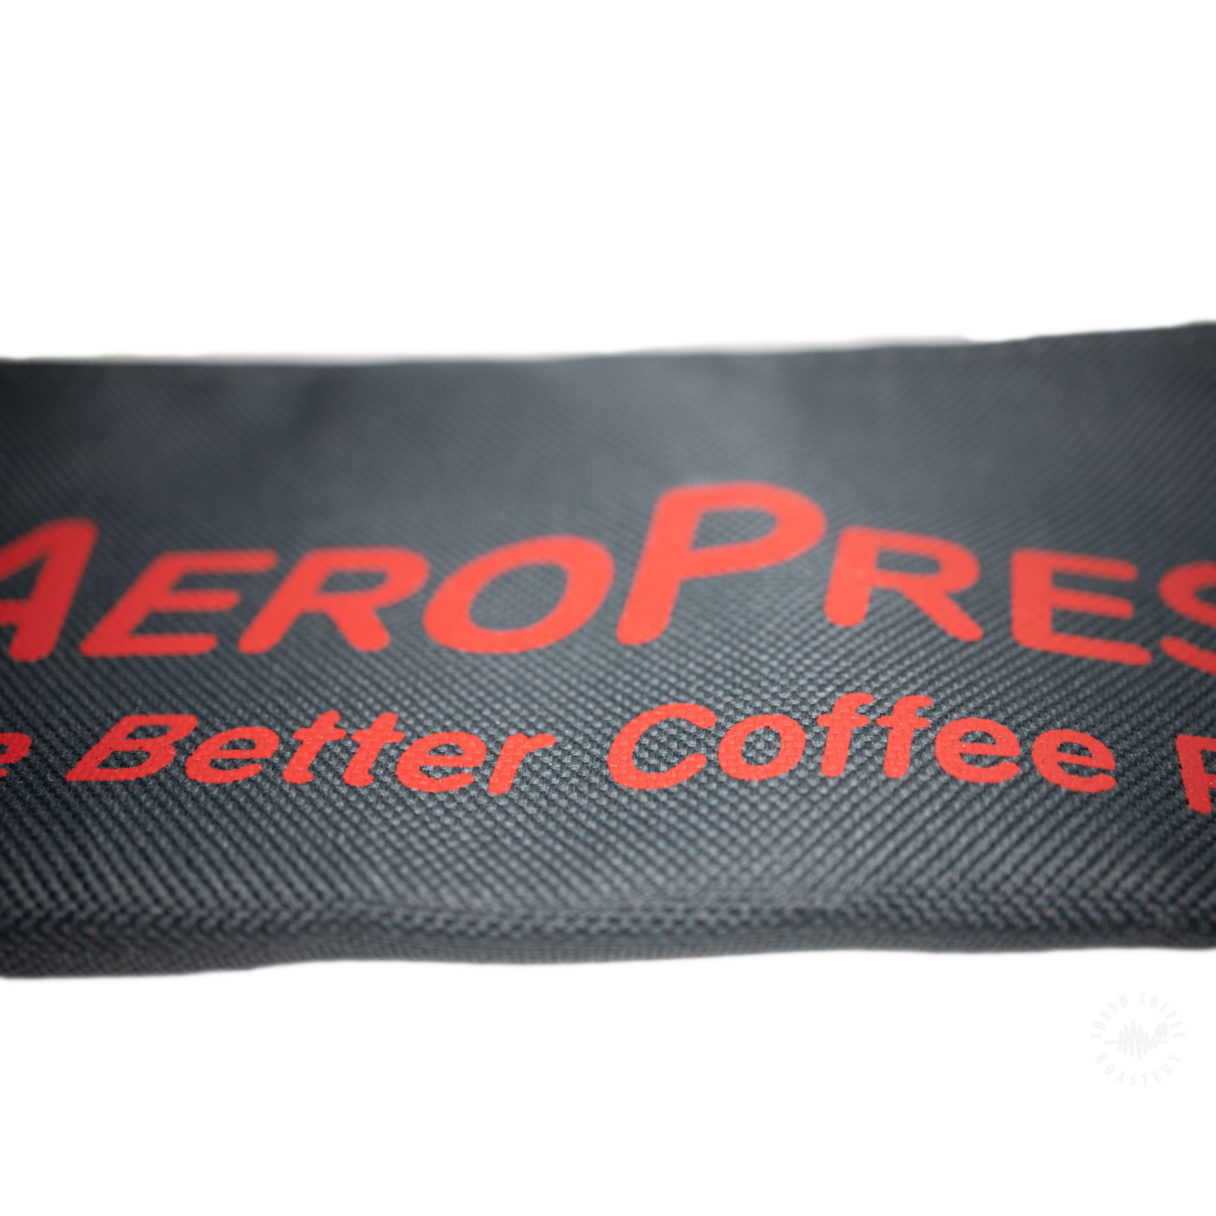 Aeropress coffee maker bag